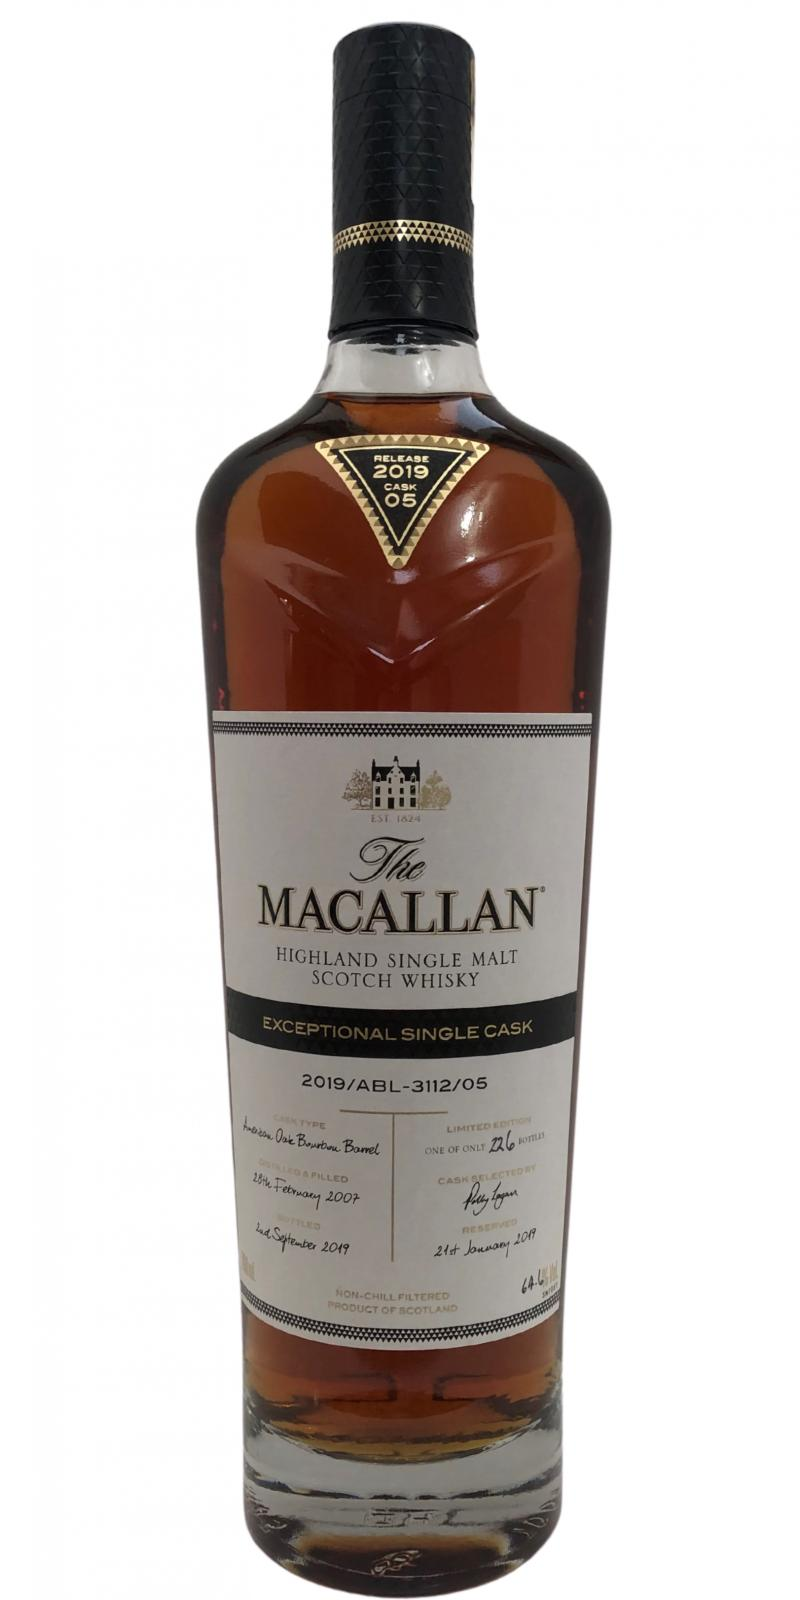 Macallan 2019 / ABL-3112-05